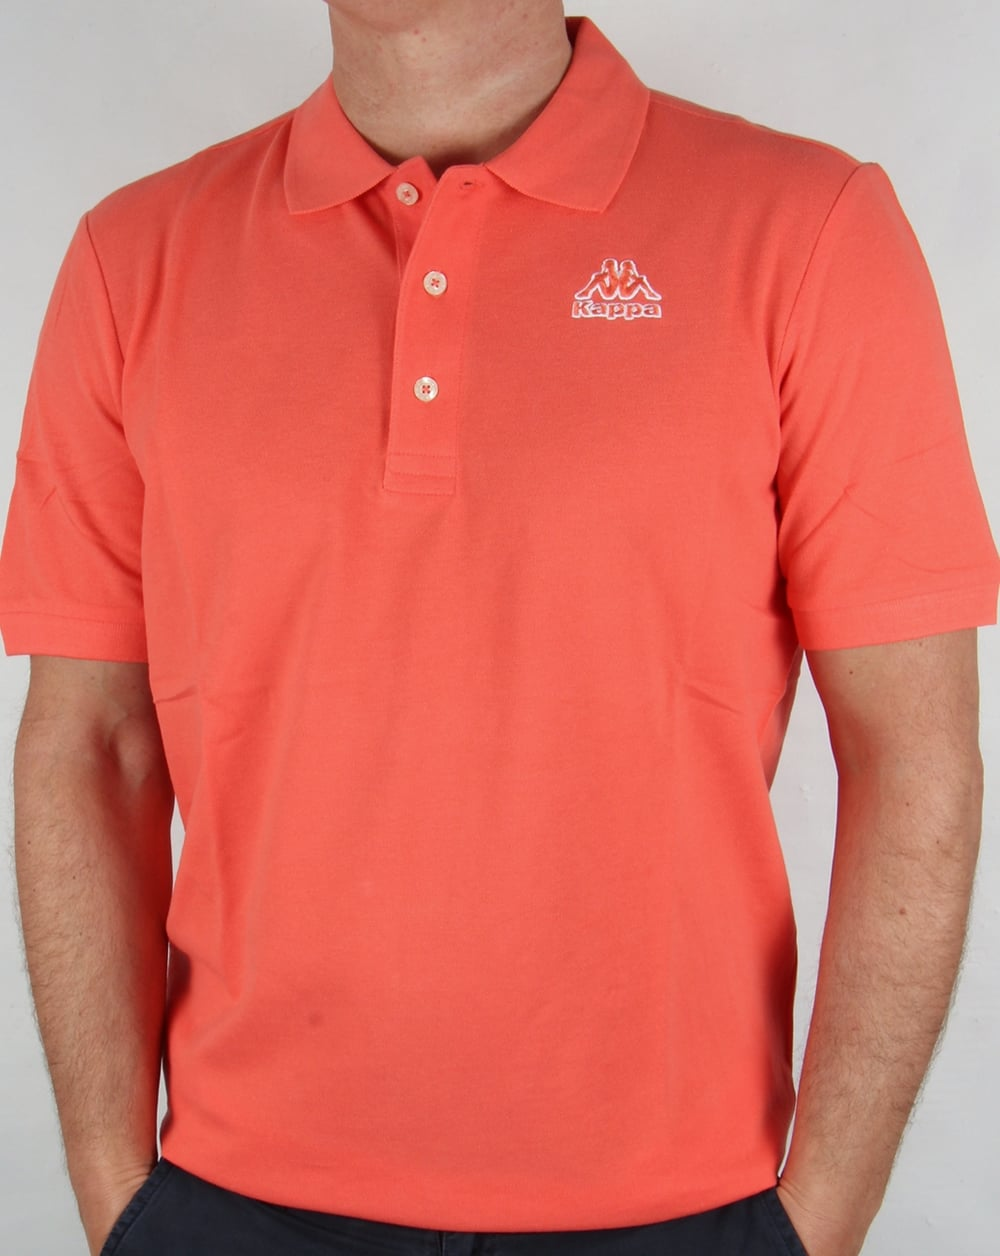 454e86796b Kappa Robe di Kappa Omini Polo Shirt Coral